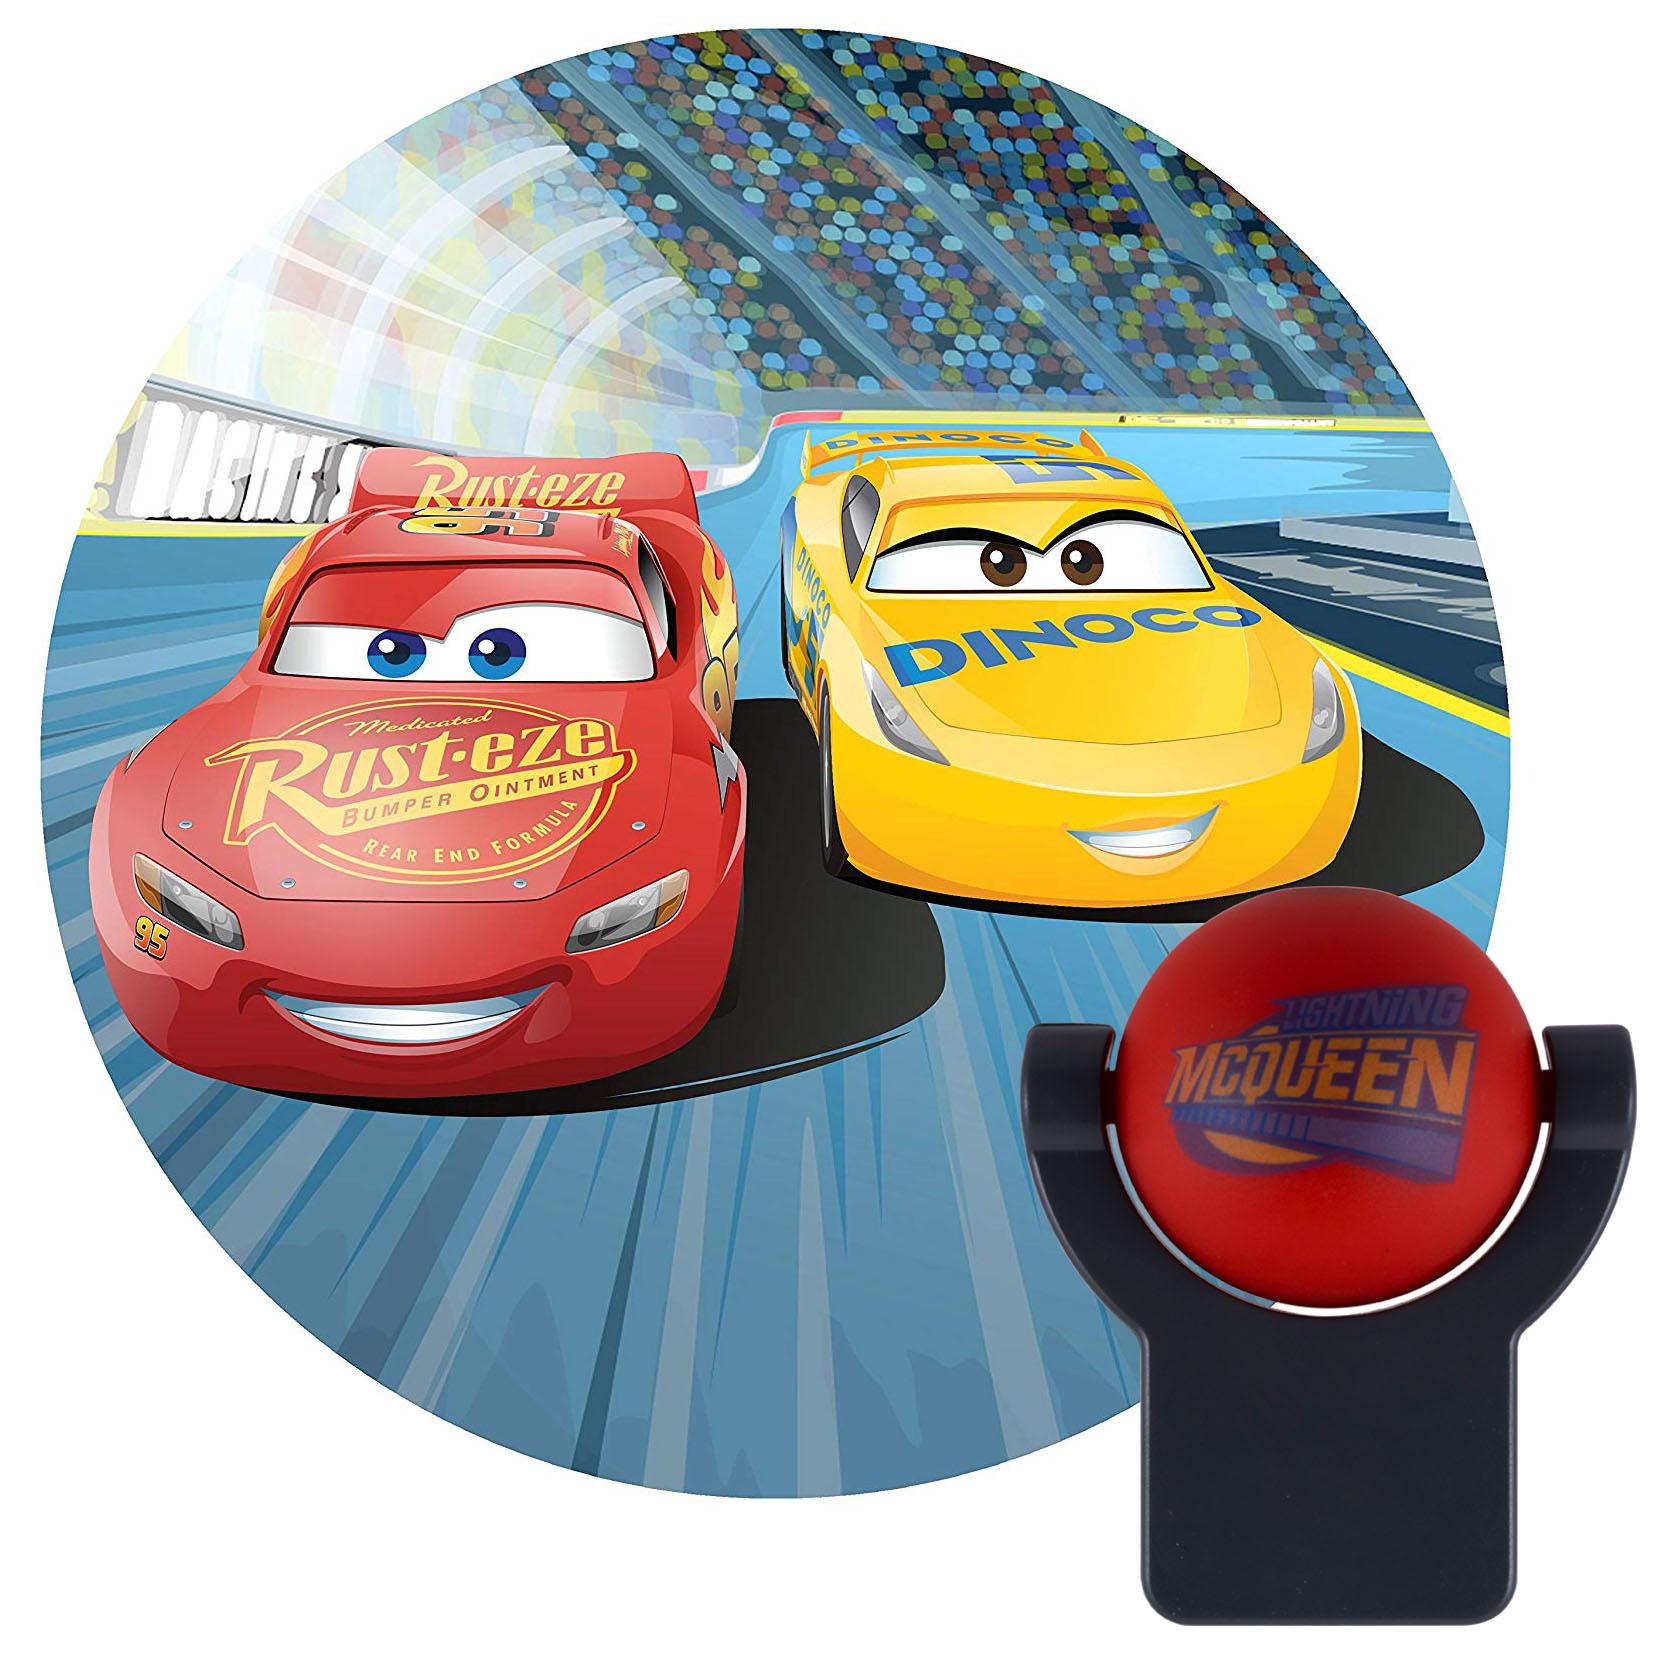 Projectables Disney/Pixar Cars LED Plug-In Night Light, Lightning McQueen and Cruz Ramirez Image, 11742